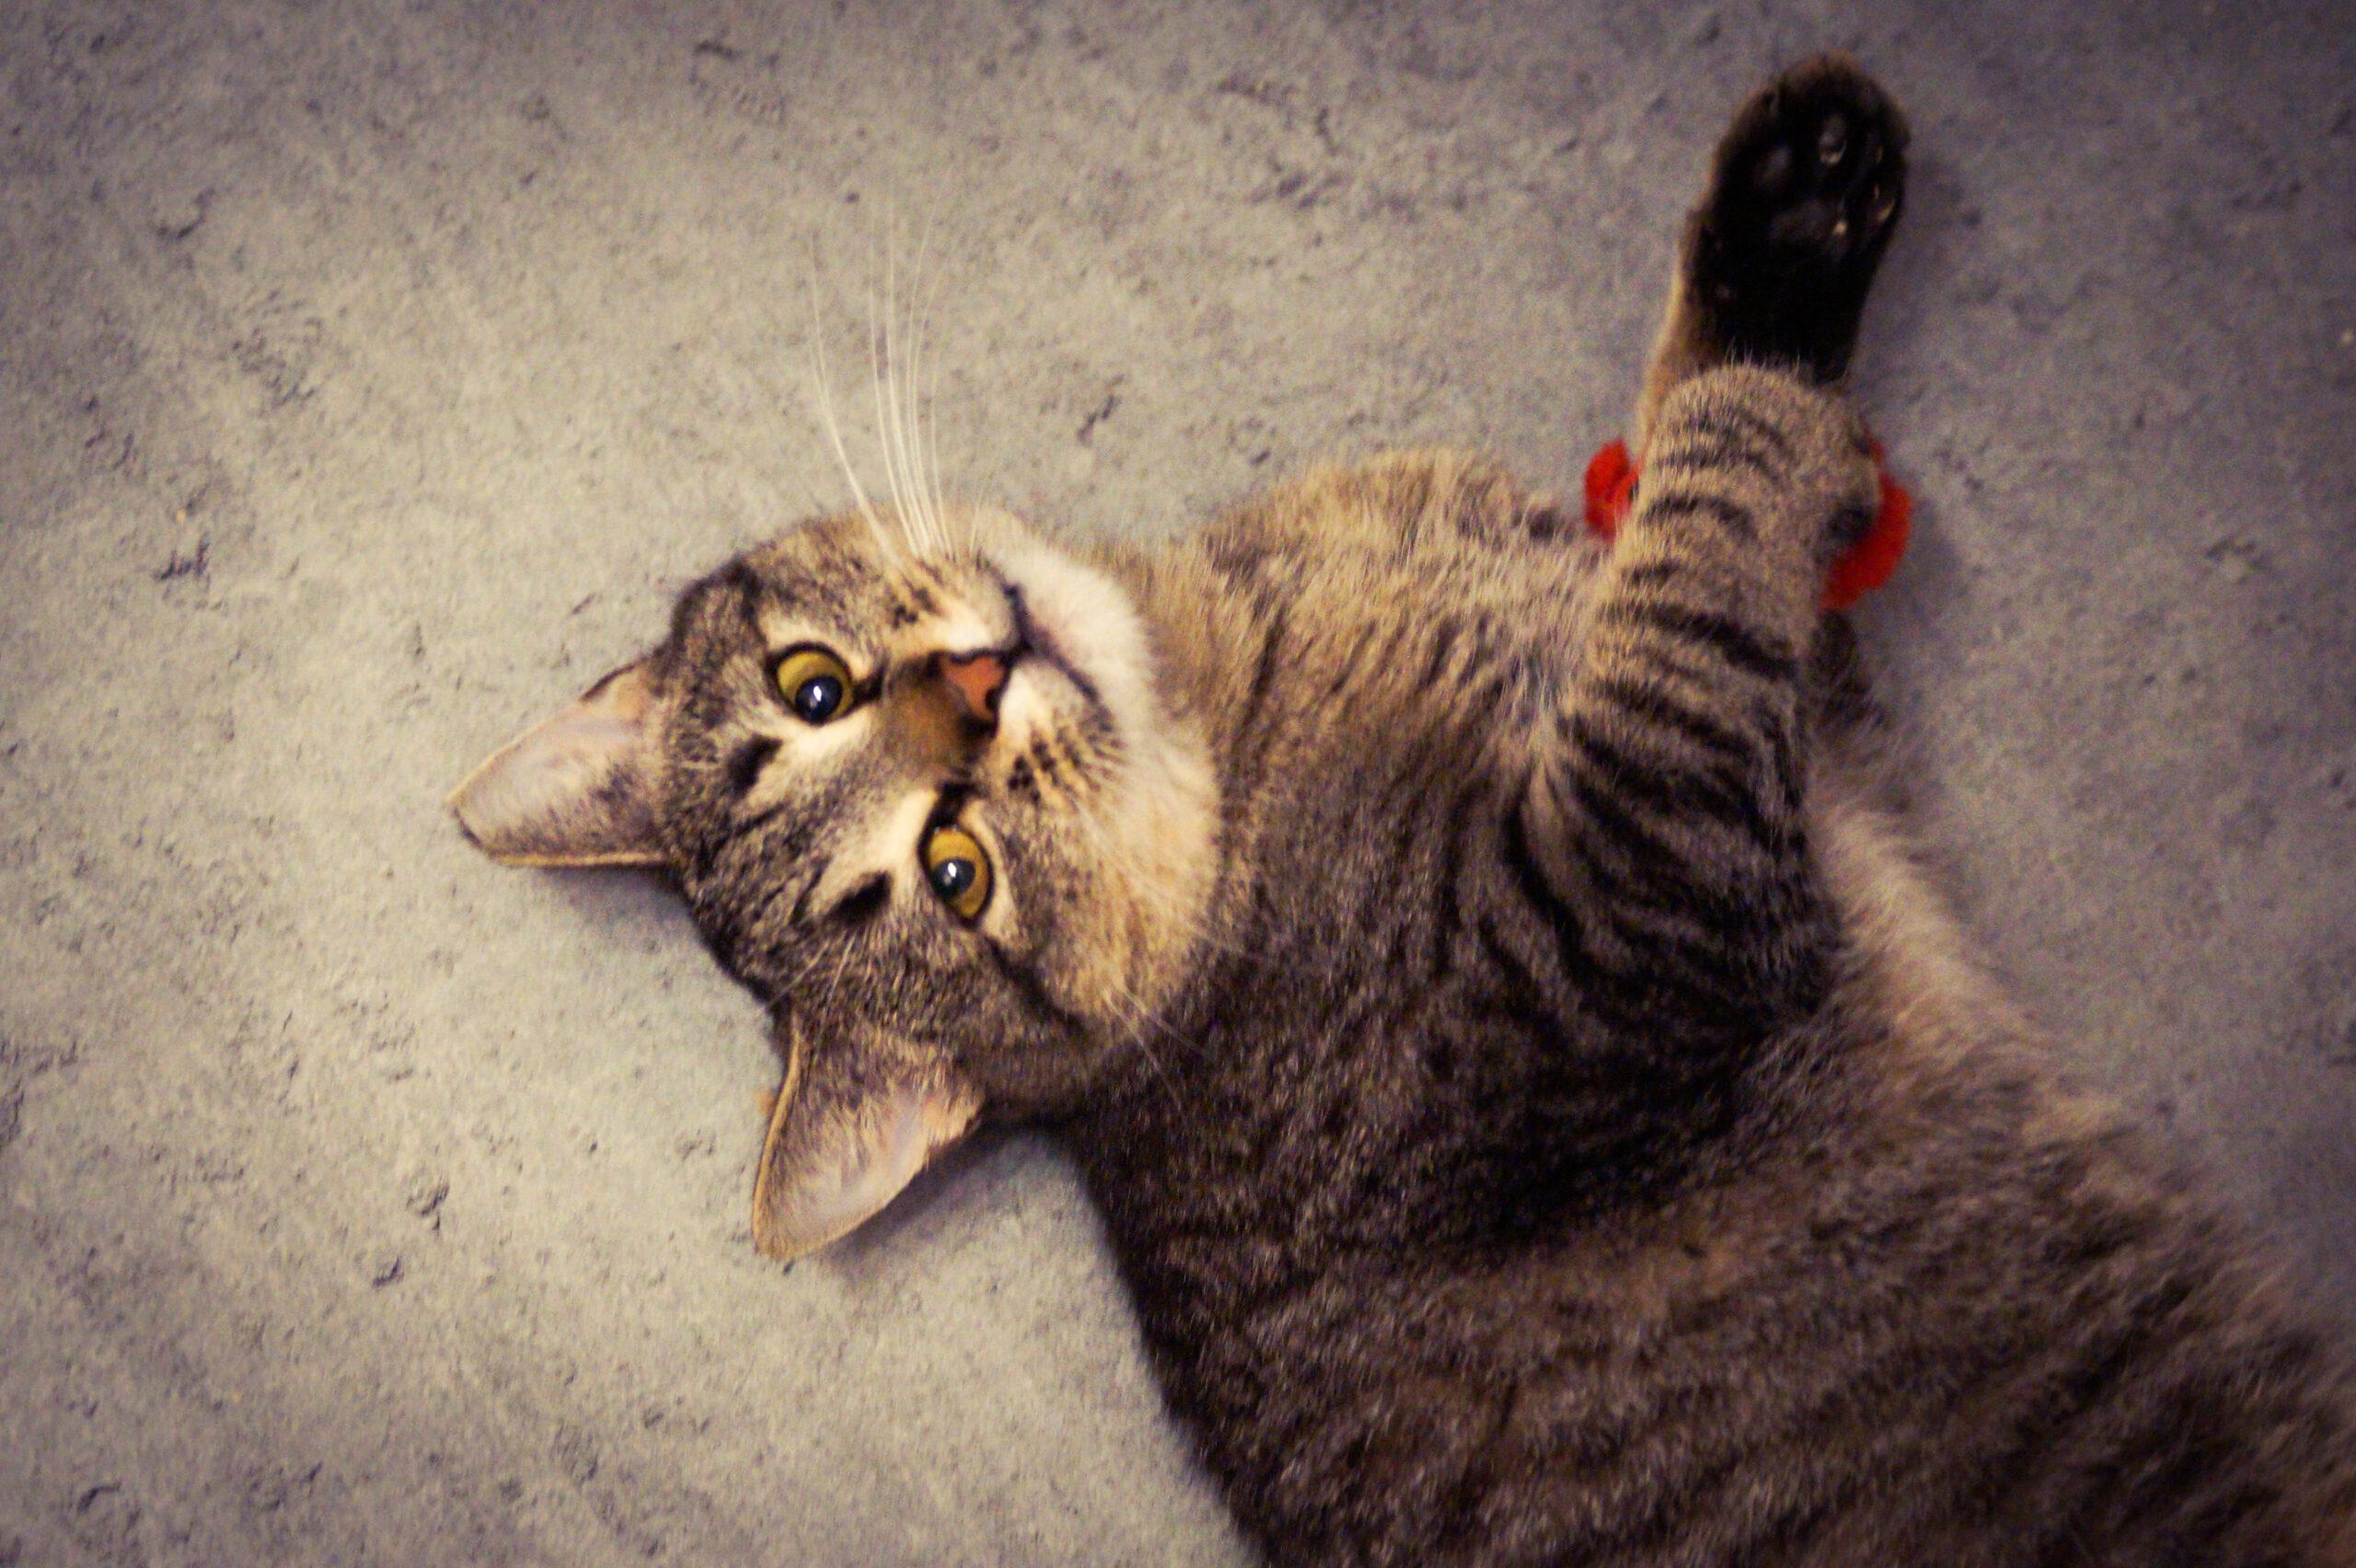 Szara pręgowana kotka